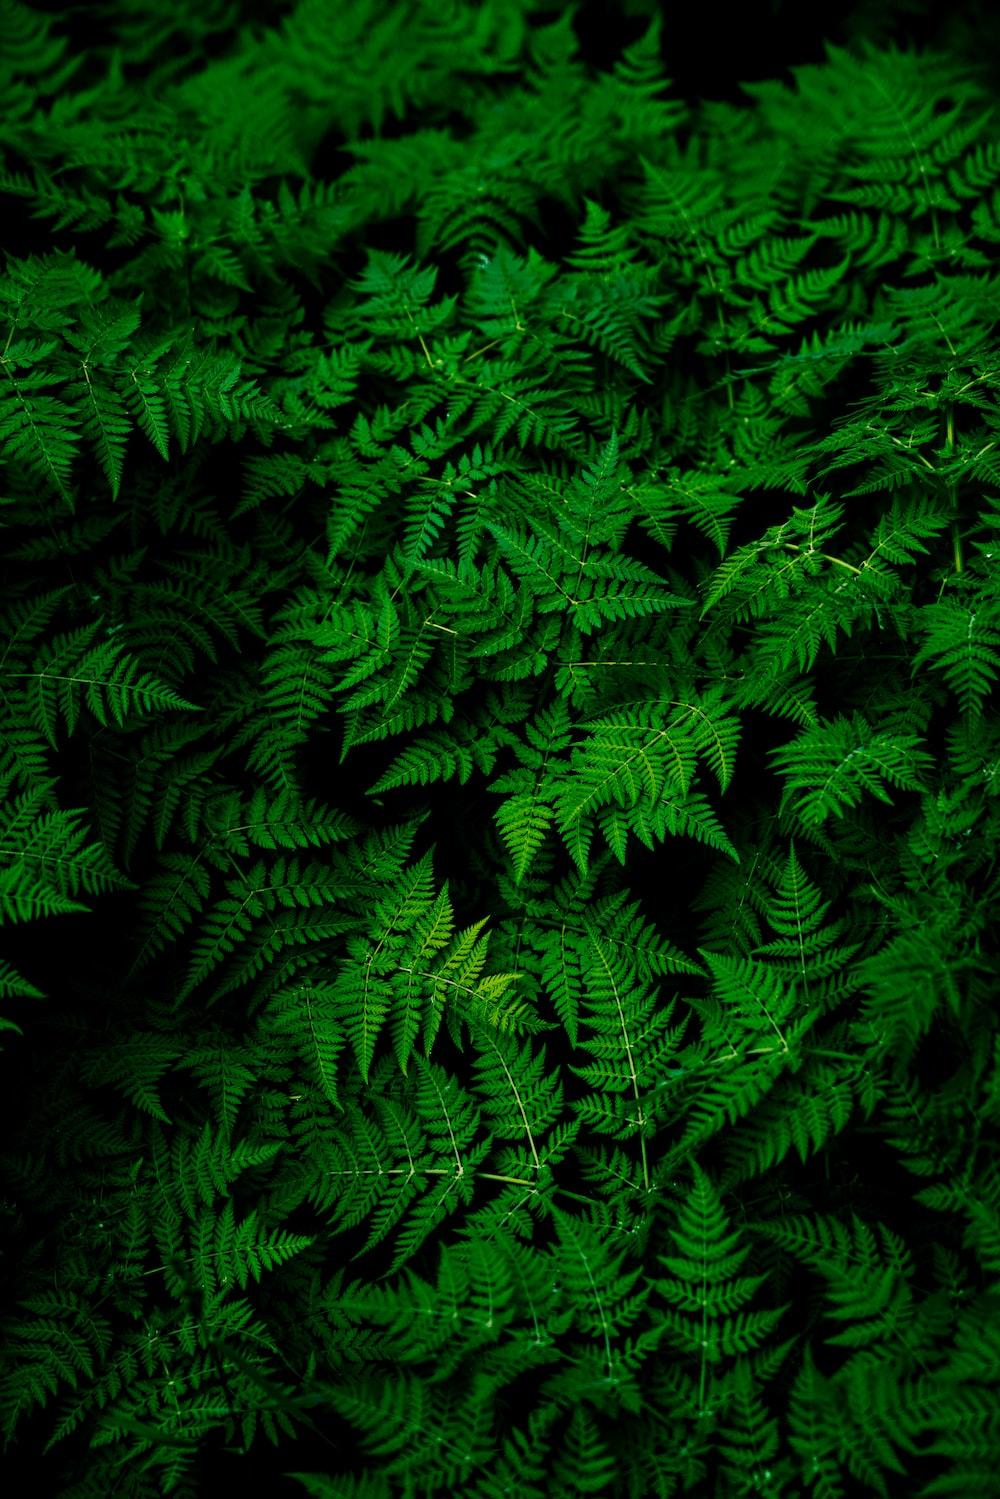 photo of green fern plant